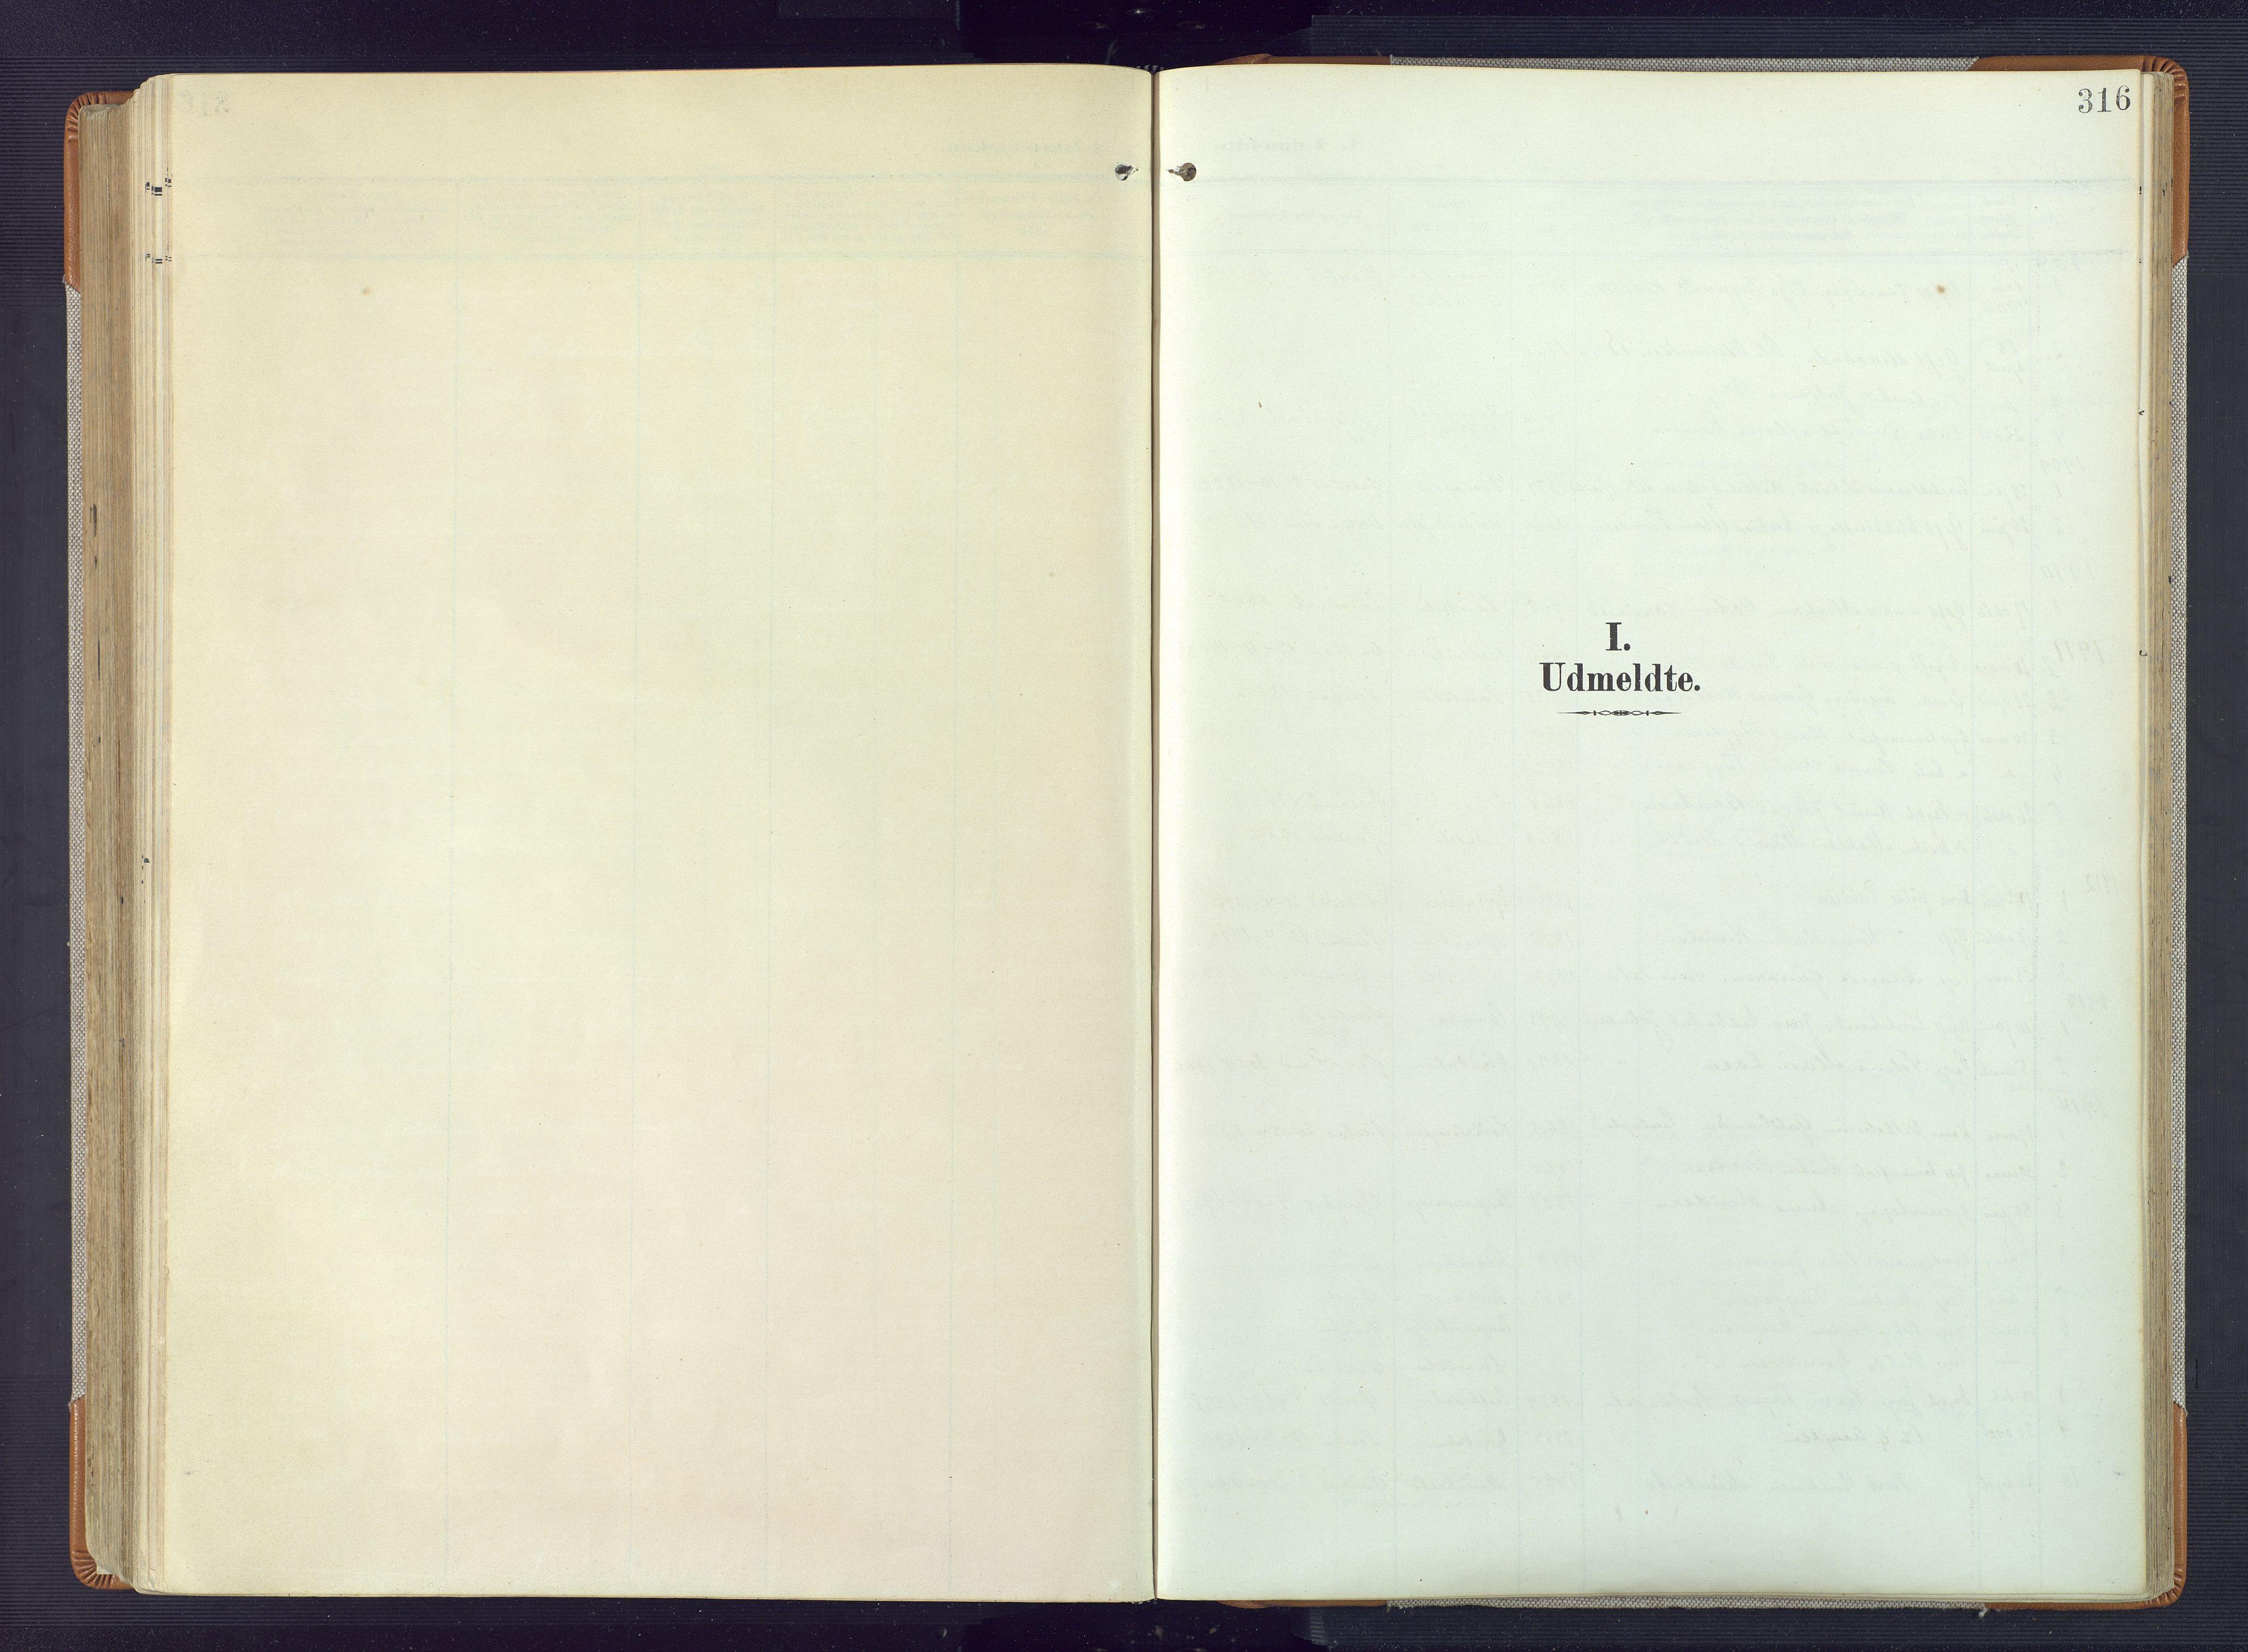 SAK, Øyestad sokneprestkontor, F/Fa/L0019: Ministerialbok nr. A 19, 1908-1922, s. 316